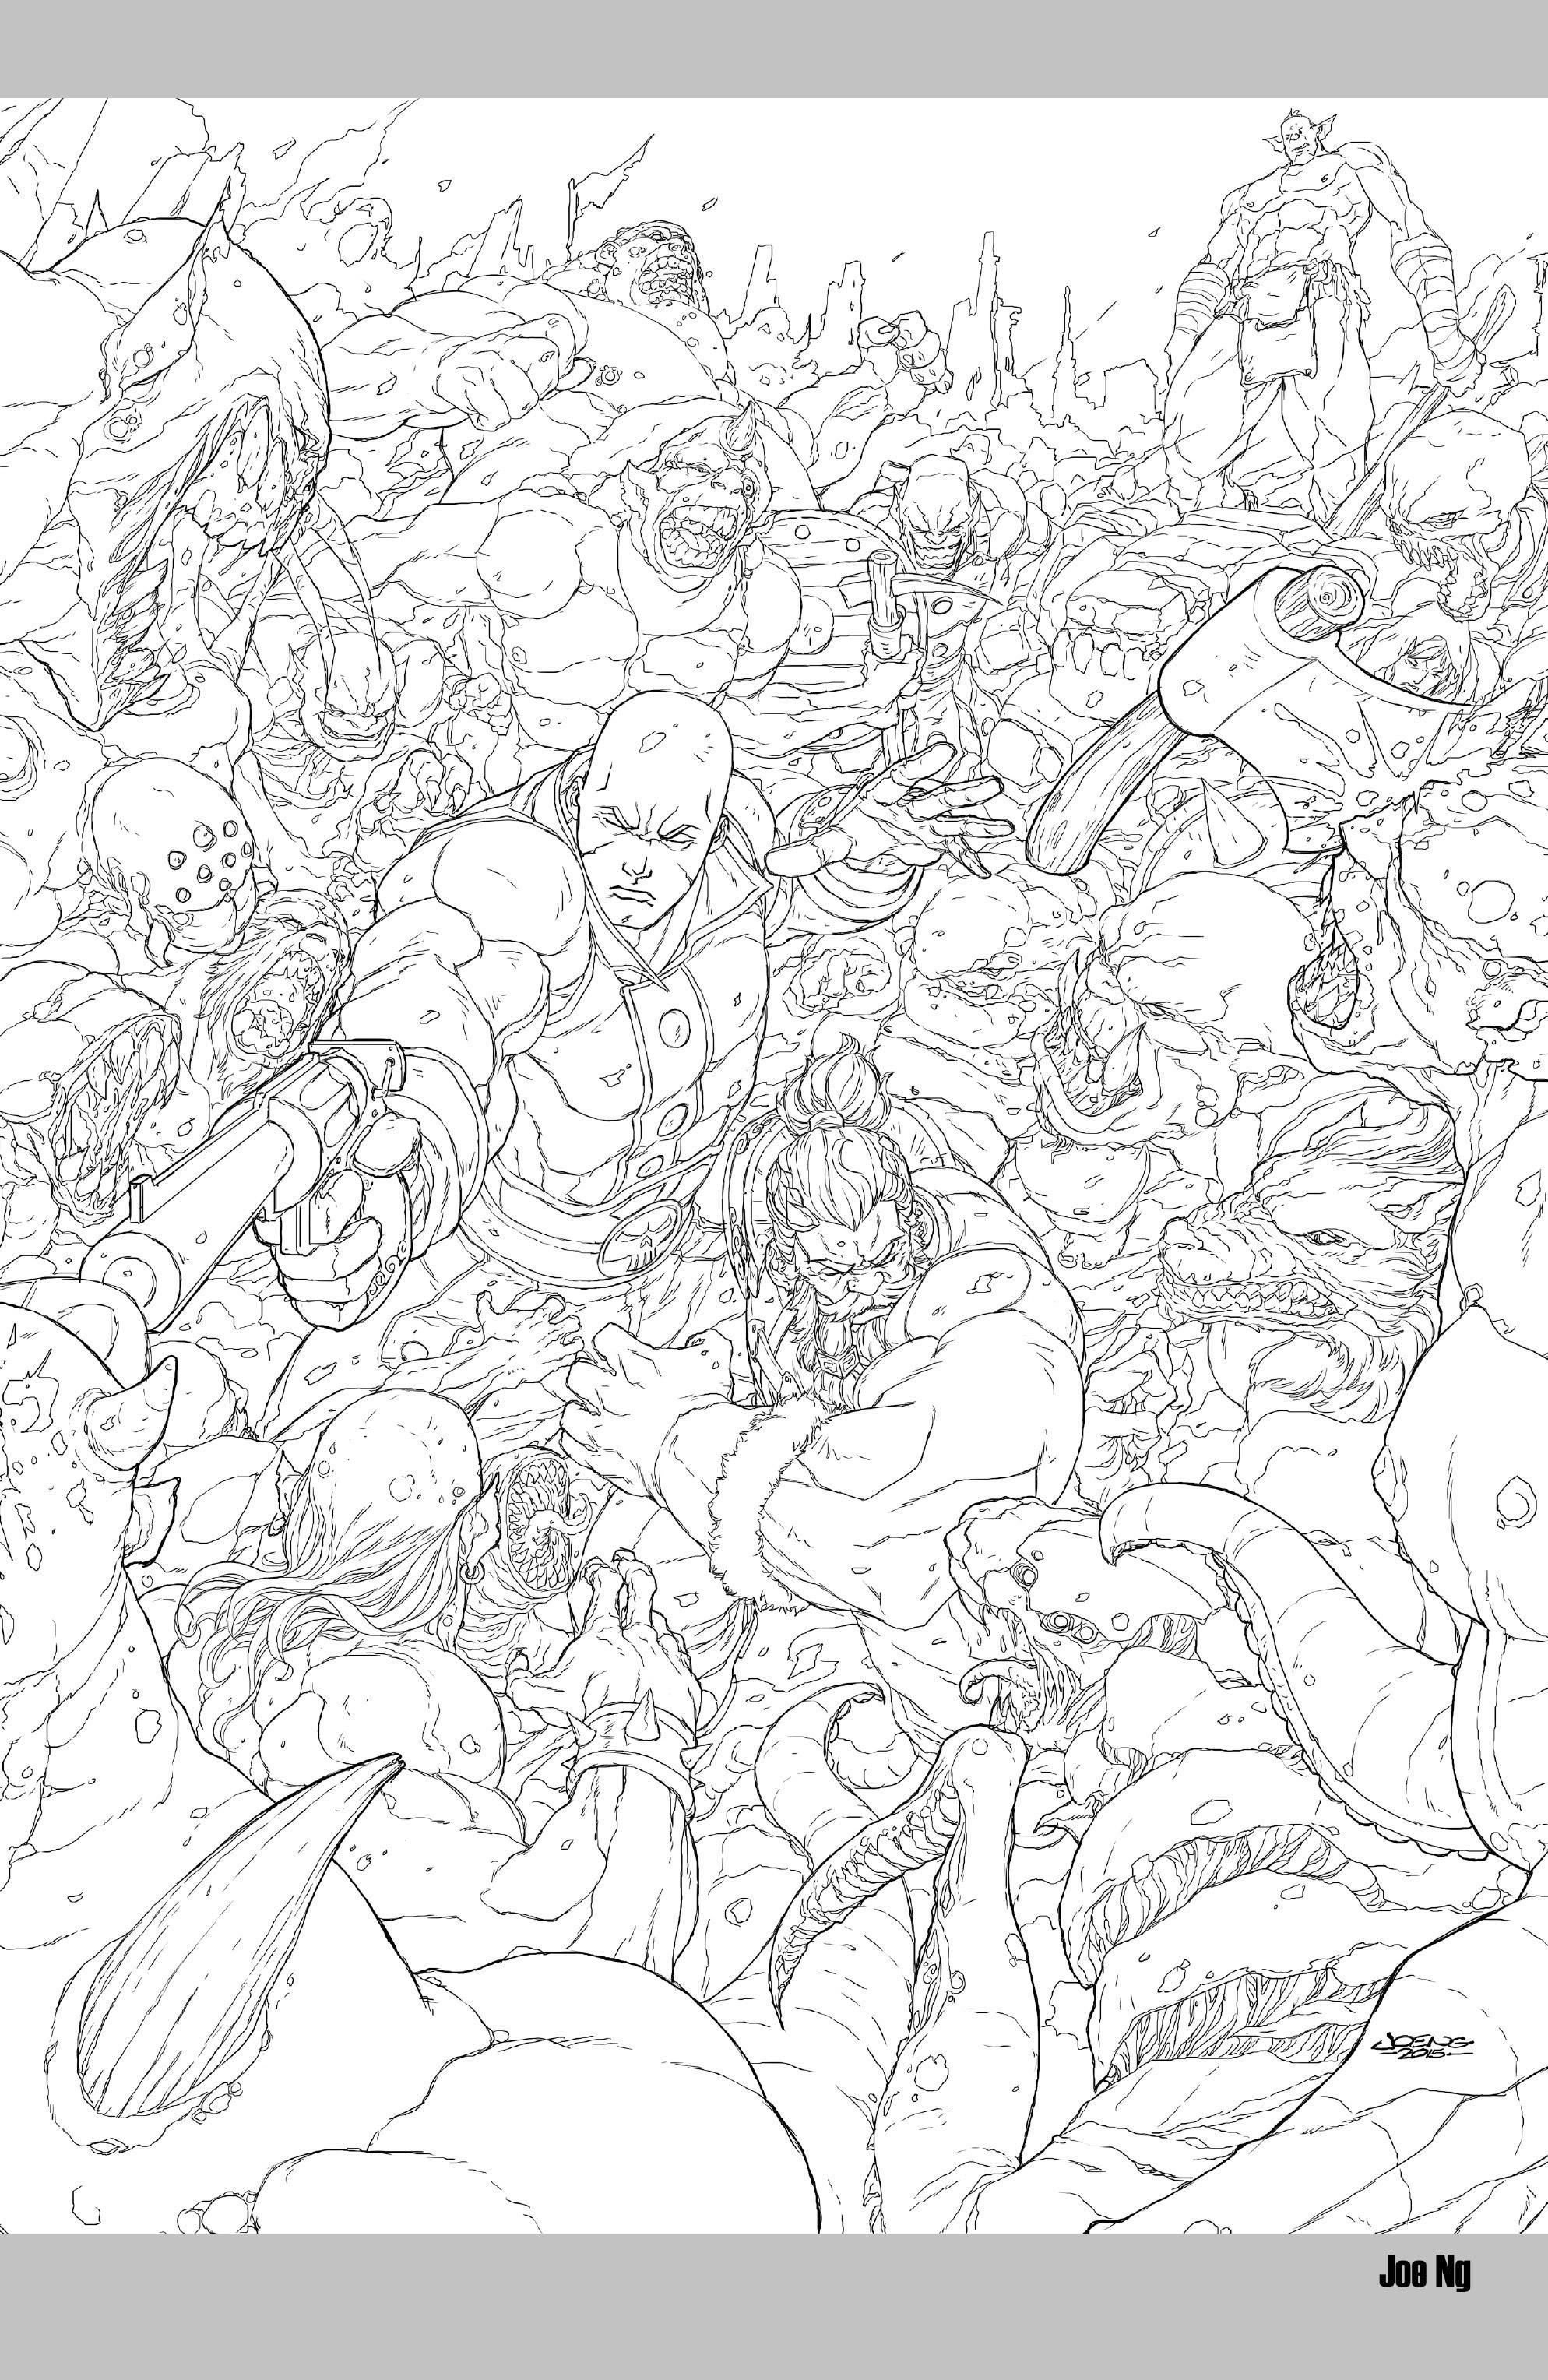 Read online Skullkickers comic -  Issue #100 - 26